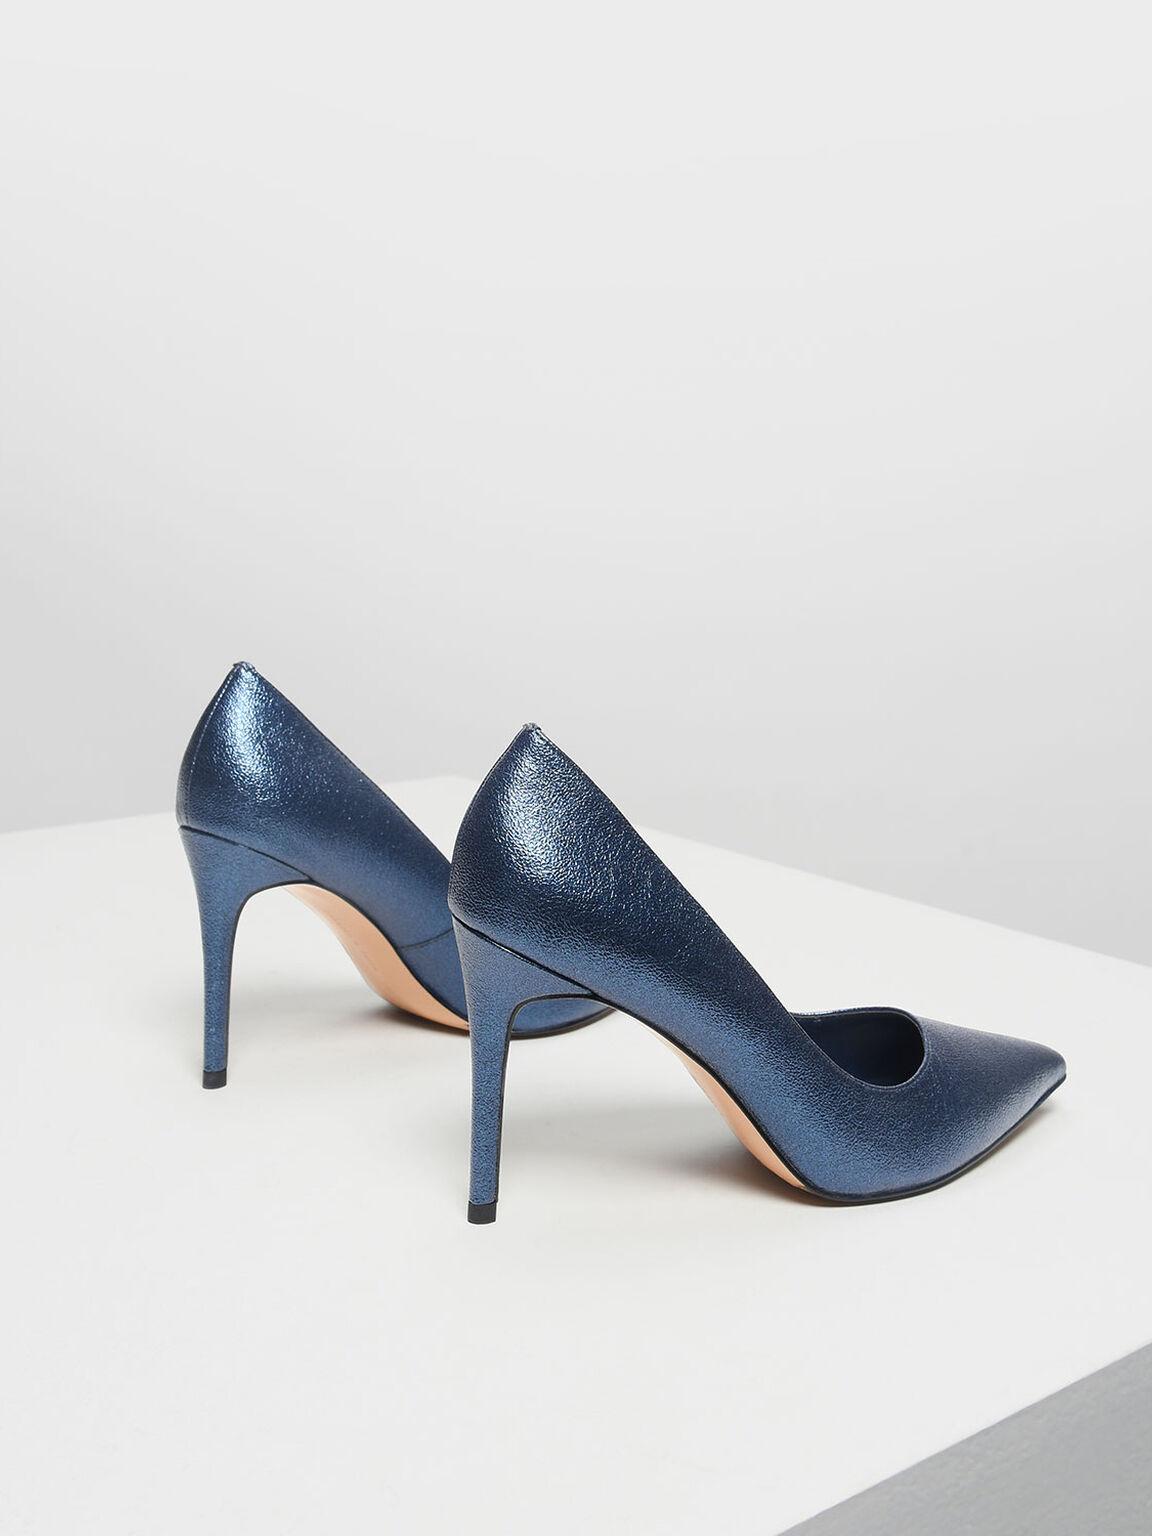 Classic Pointed Toe Pumps, Blue, hi-res